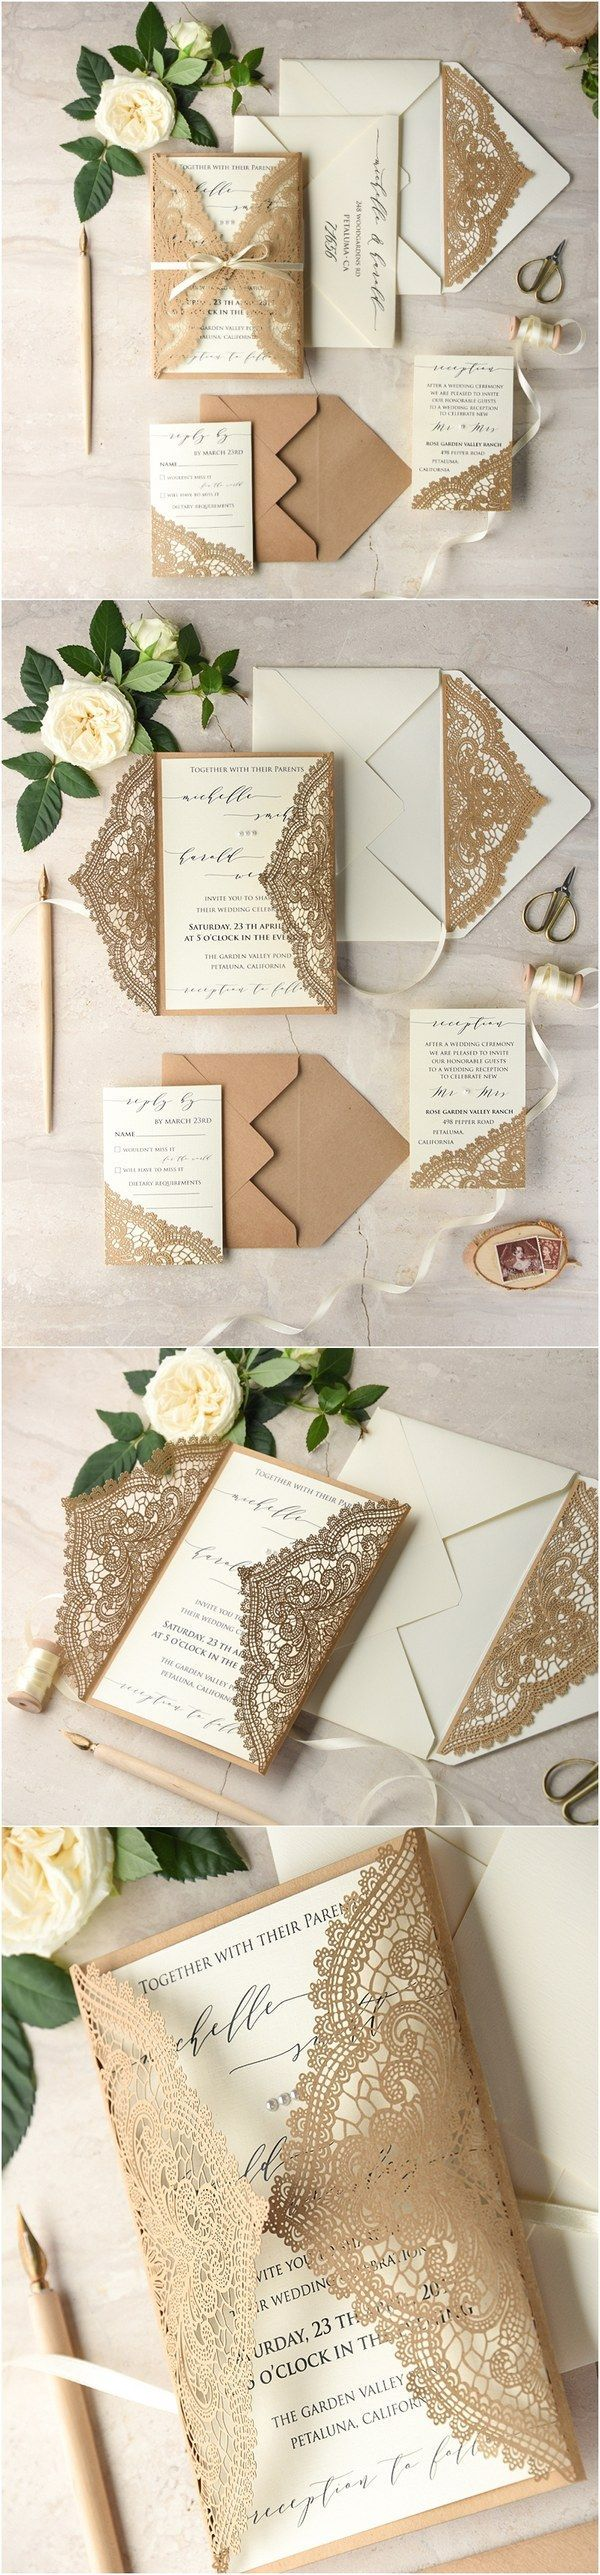 Ivory kraft paper laser cut lace rustic wedding invitations 01lCNz / http://www.deerpearlflowers.com/laser-cut-wedding-invitations/